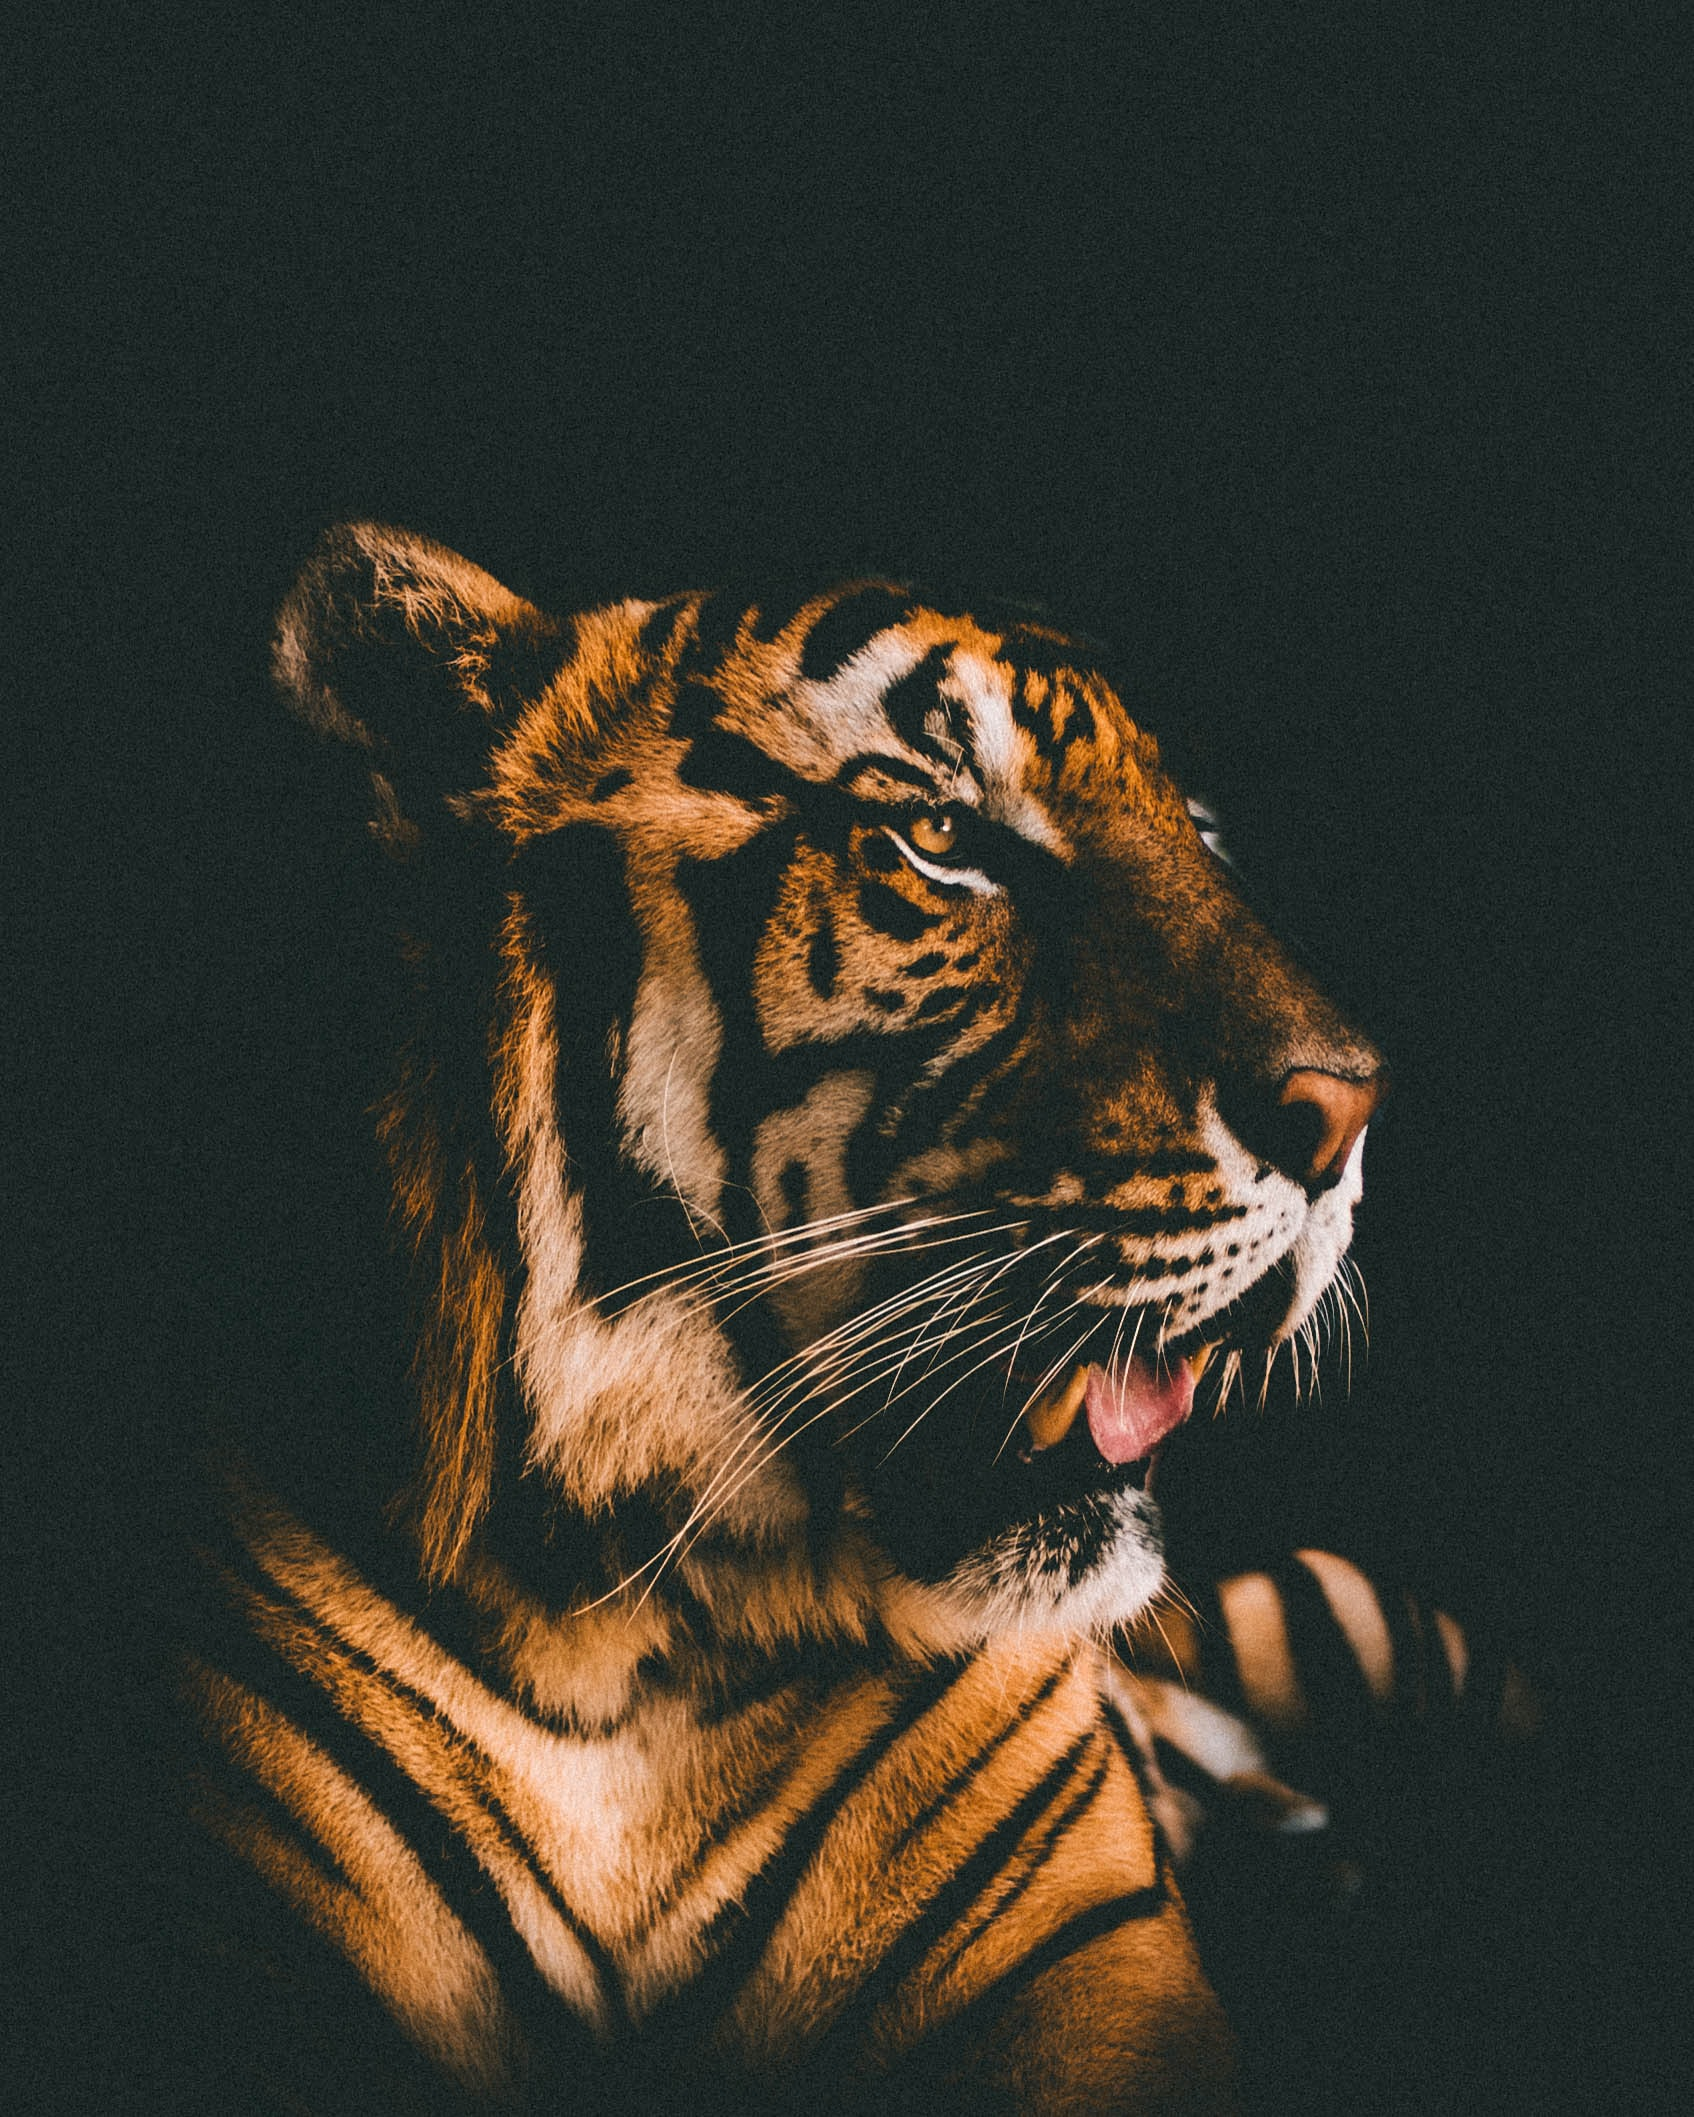 adult tiger prone lying inside dim lighted room